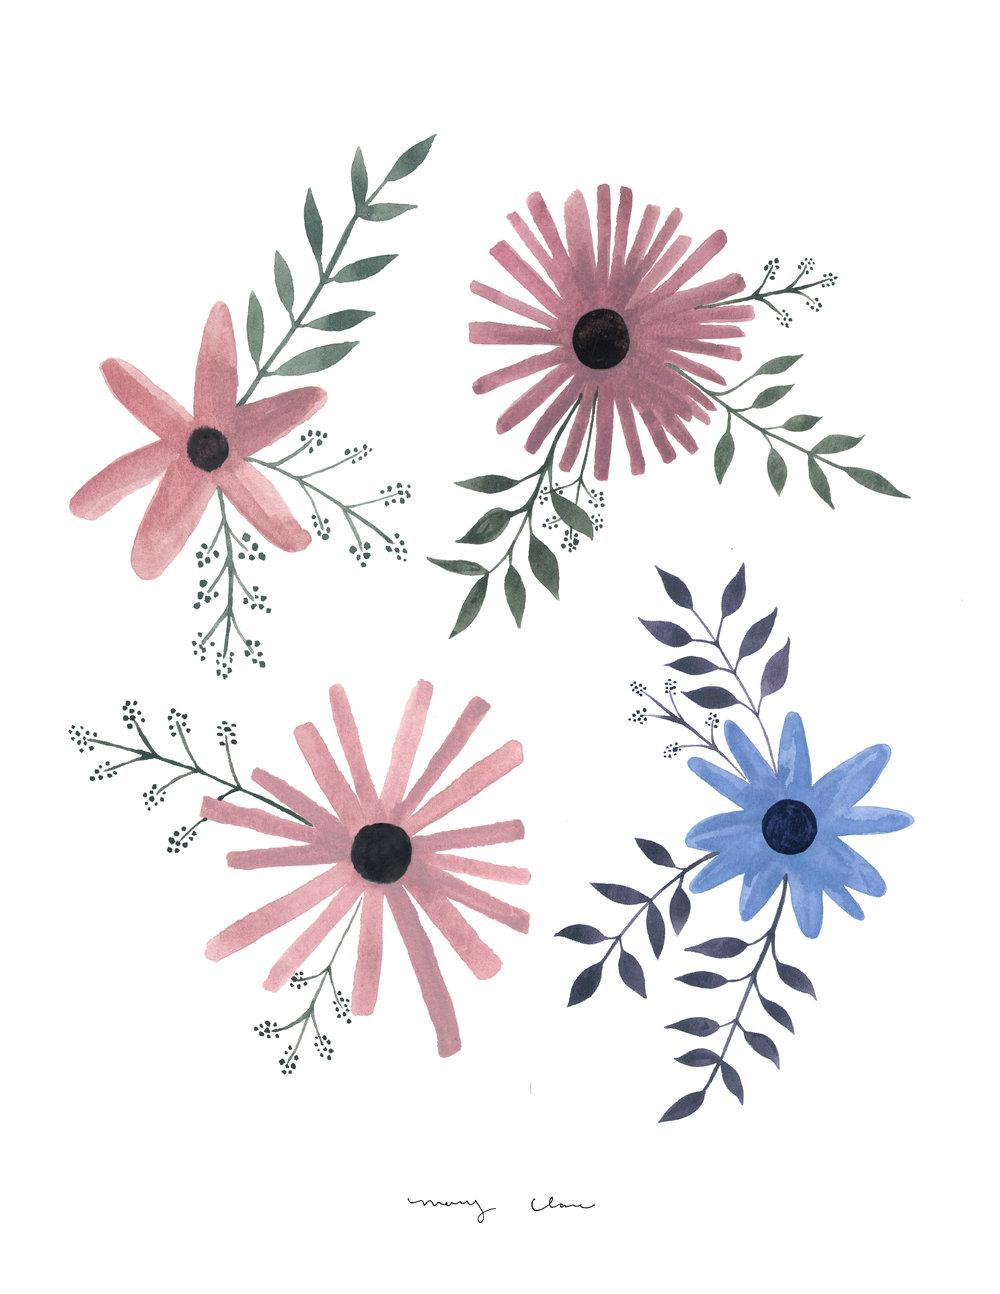 flowers-cherrys-maryclarewilkie-03-02-01-01-02-02.jpg